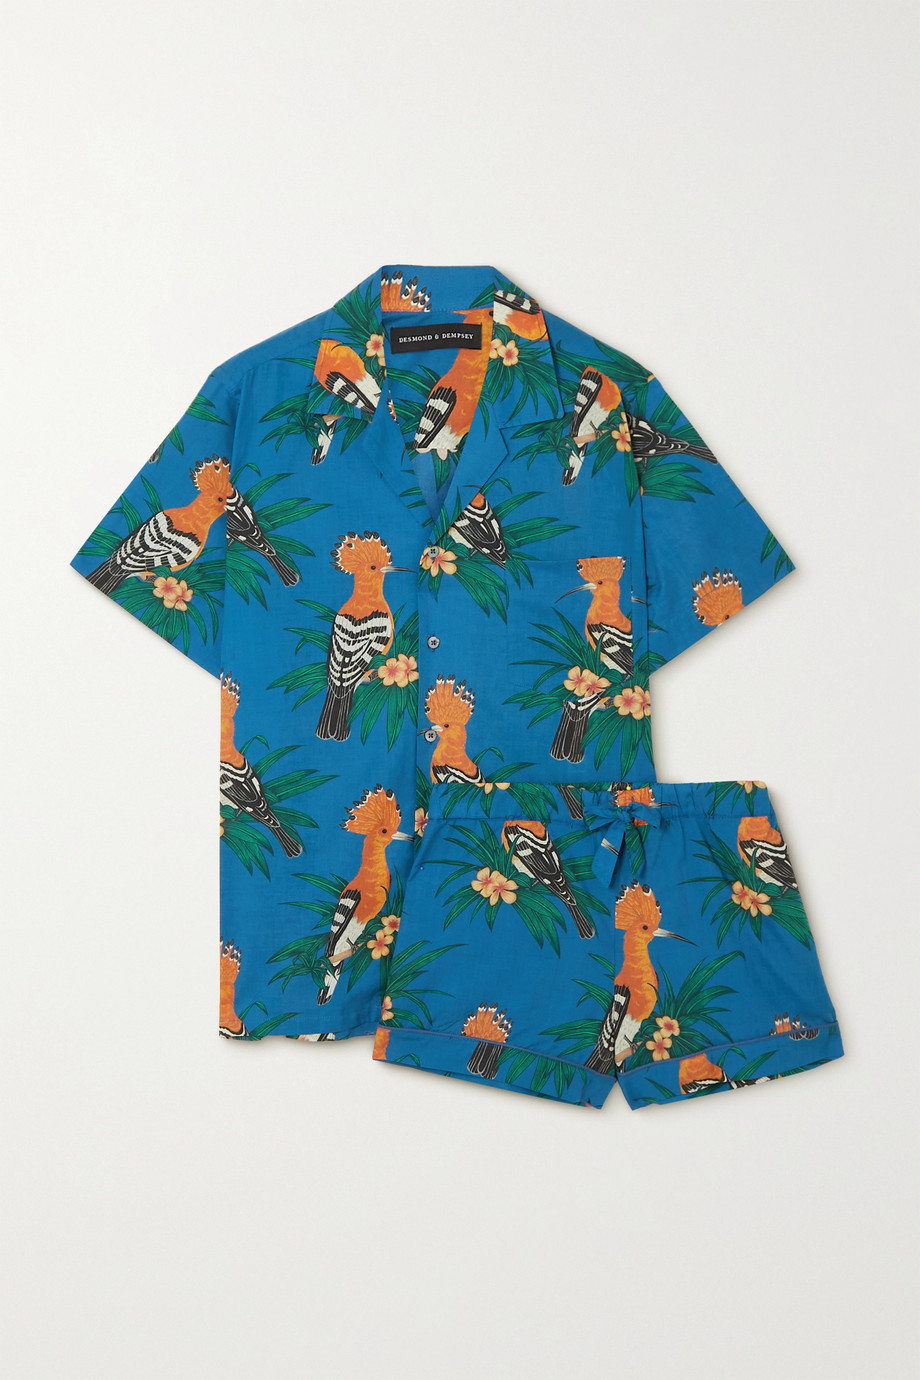 Desmond & Dempsey Pyjama en voile de coton imprimé